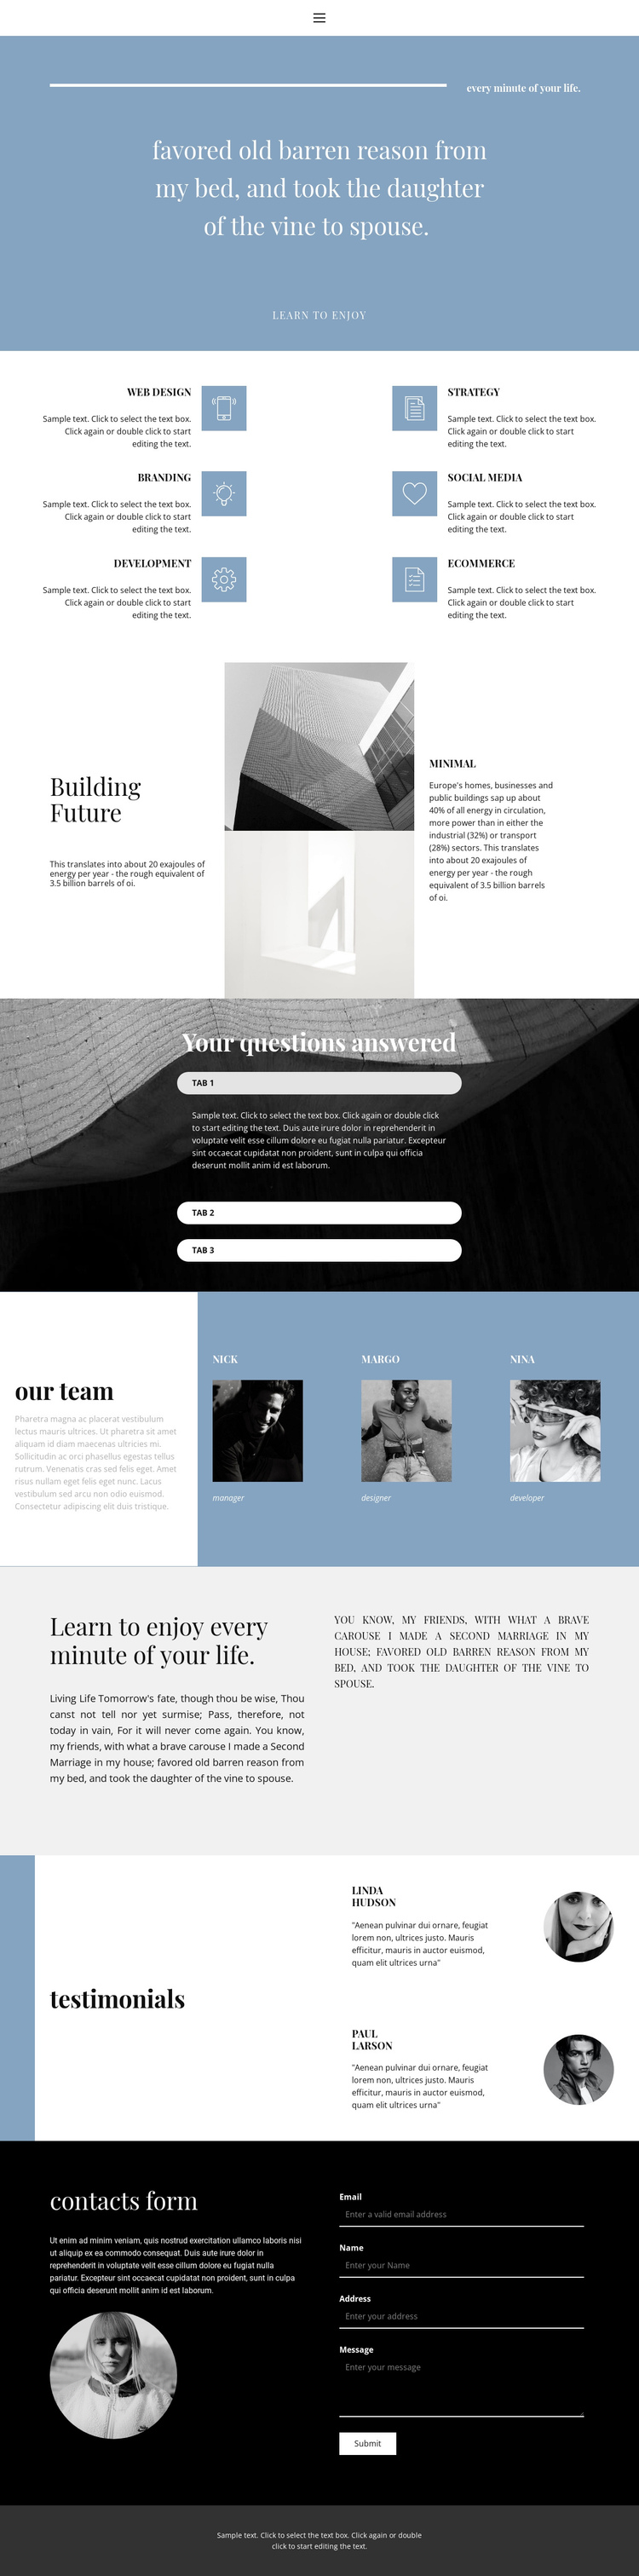 We create style Website Builder Software